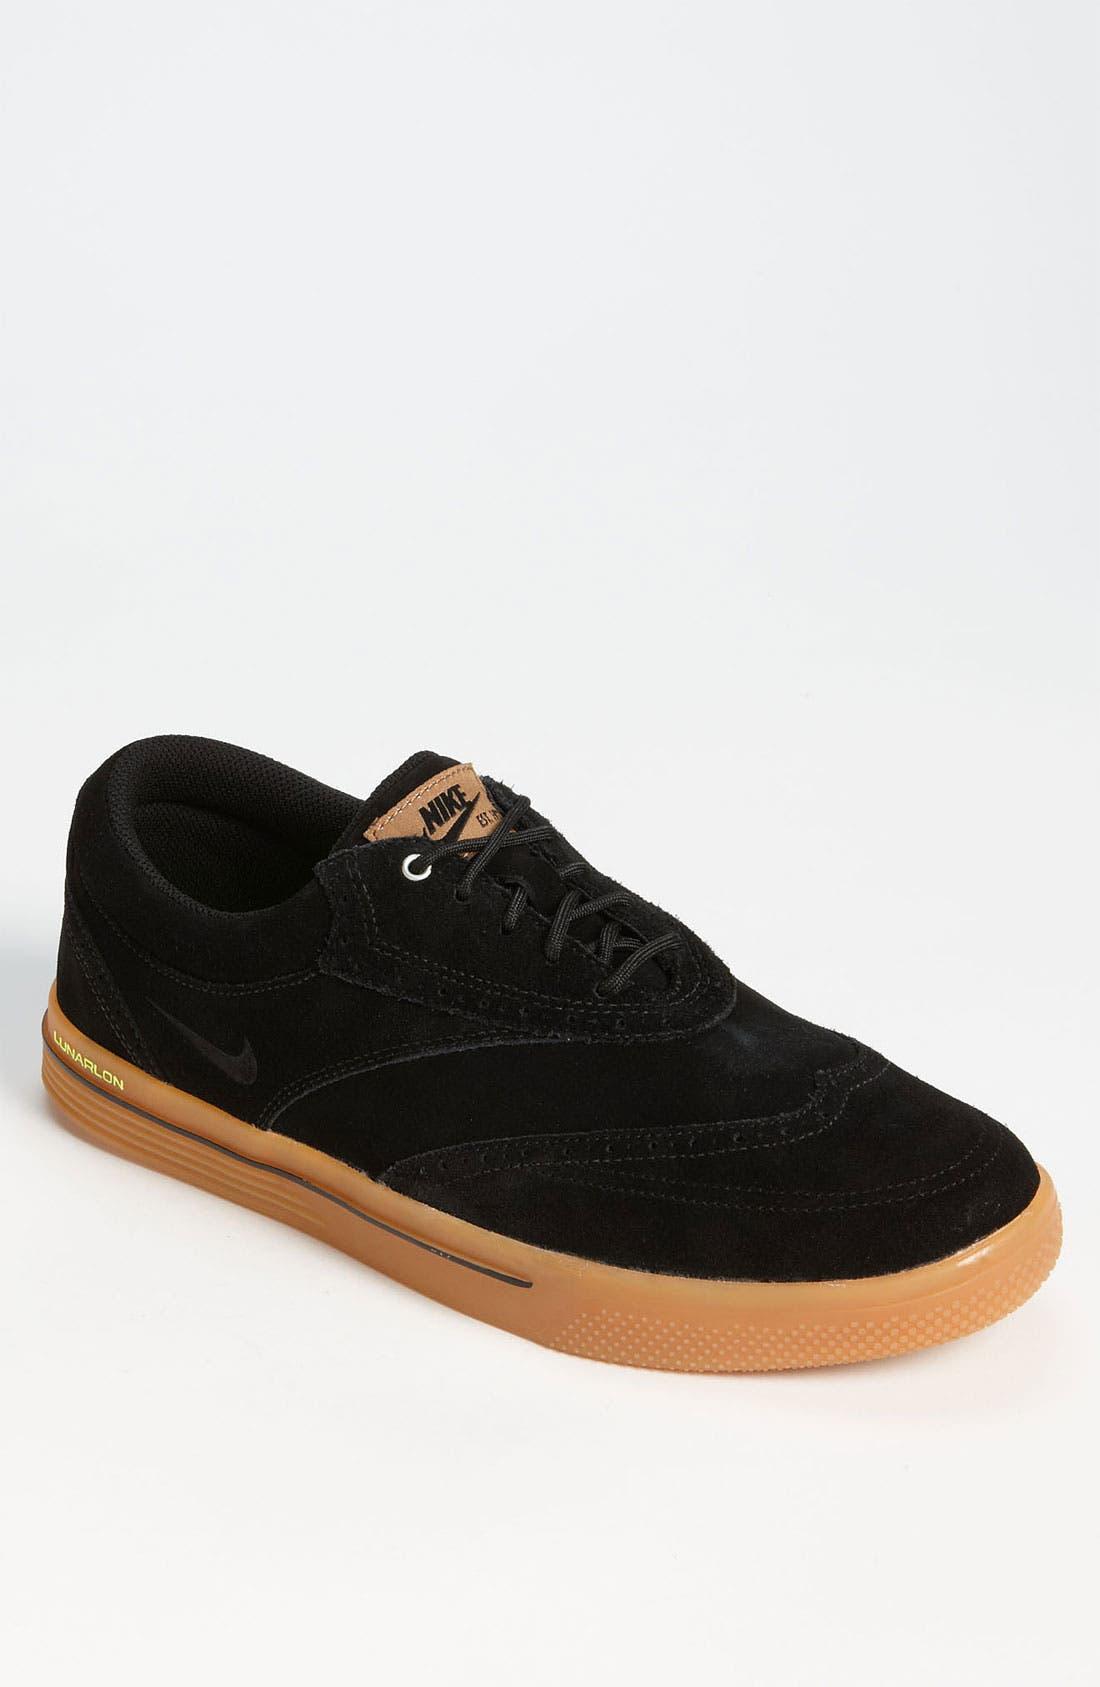 Alternate Image 1 Selected - Nike 'Lunar Swingtip' Suede Golf Shoe (Men)